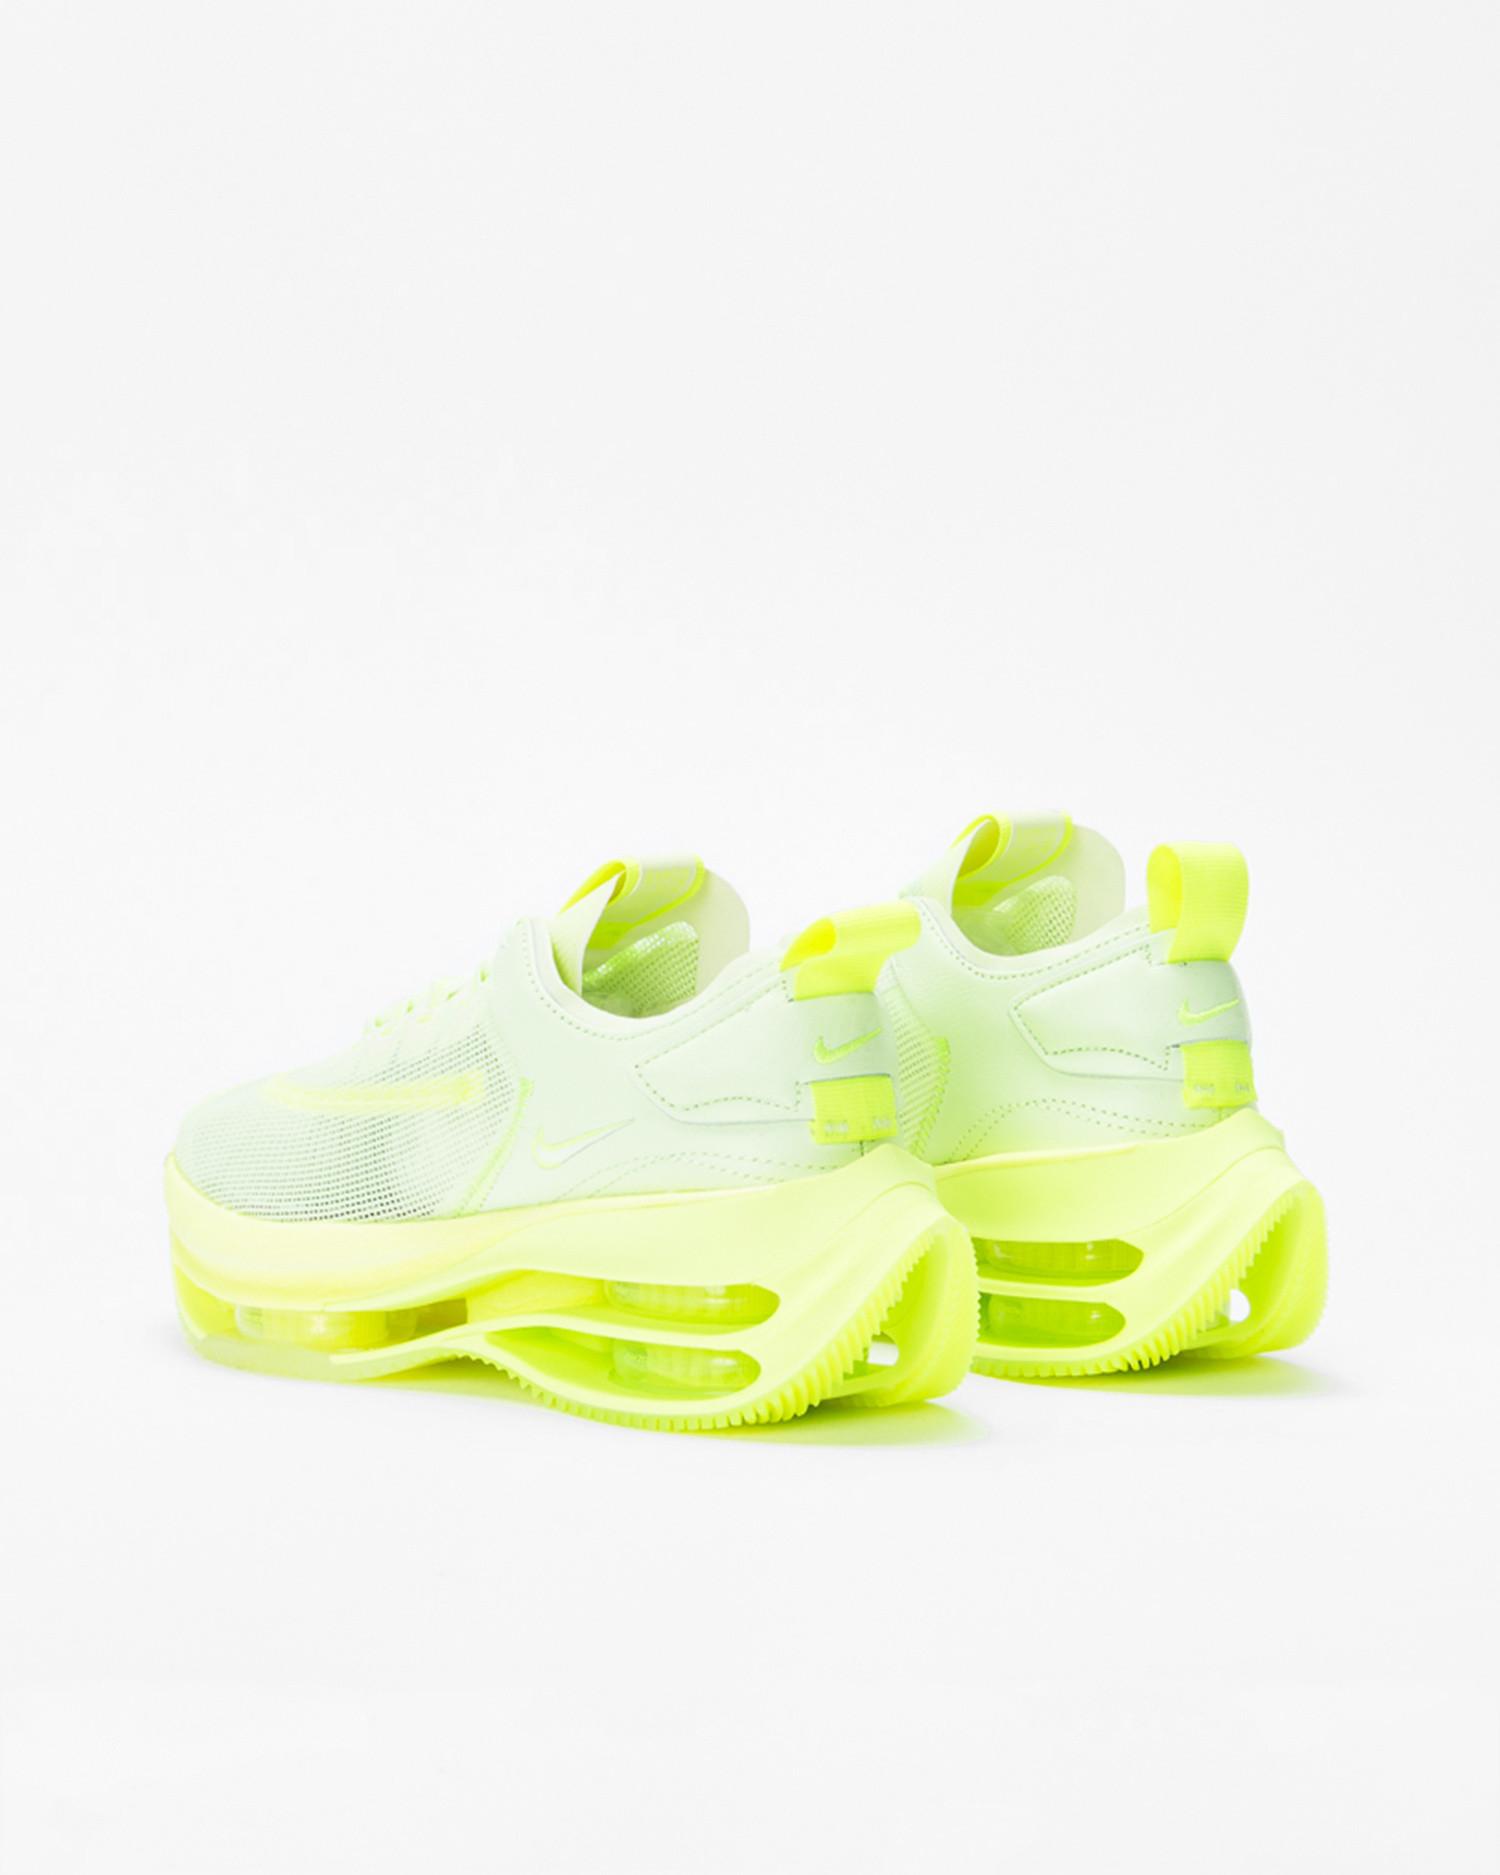 Nike Zoom Double Stacked Volt/Volt-Barely Volt